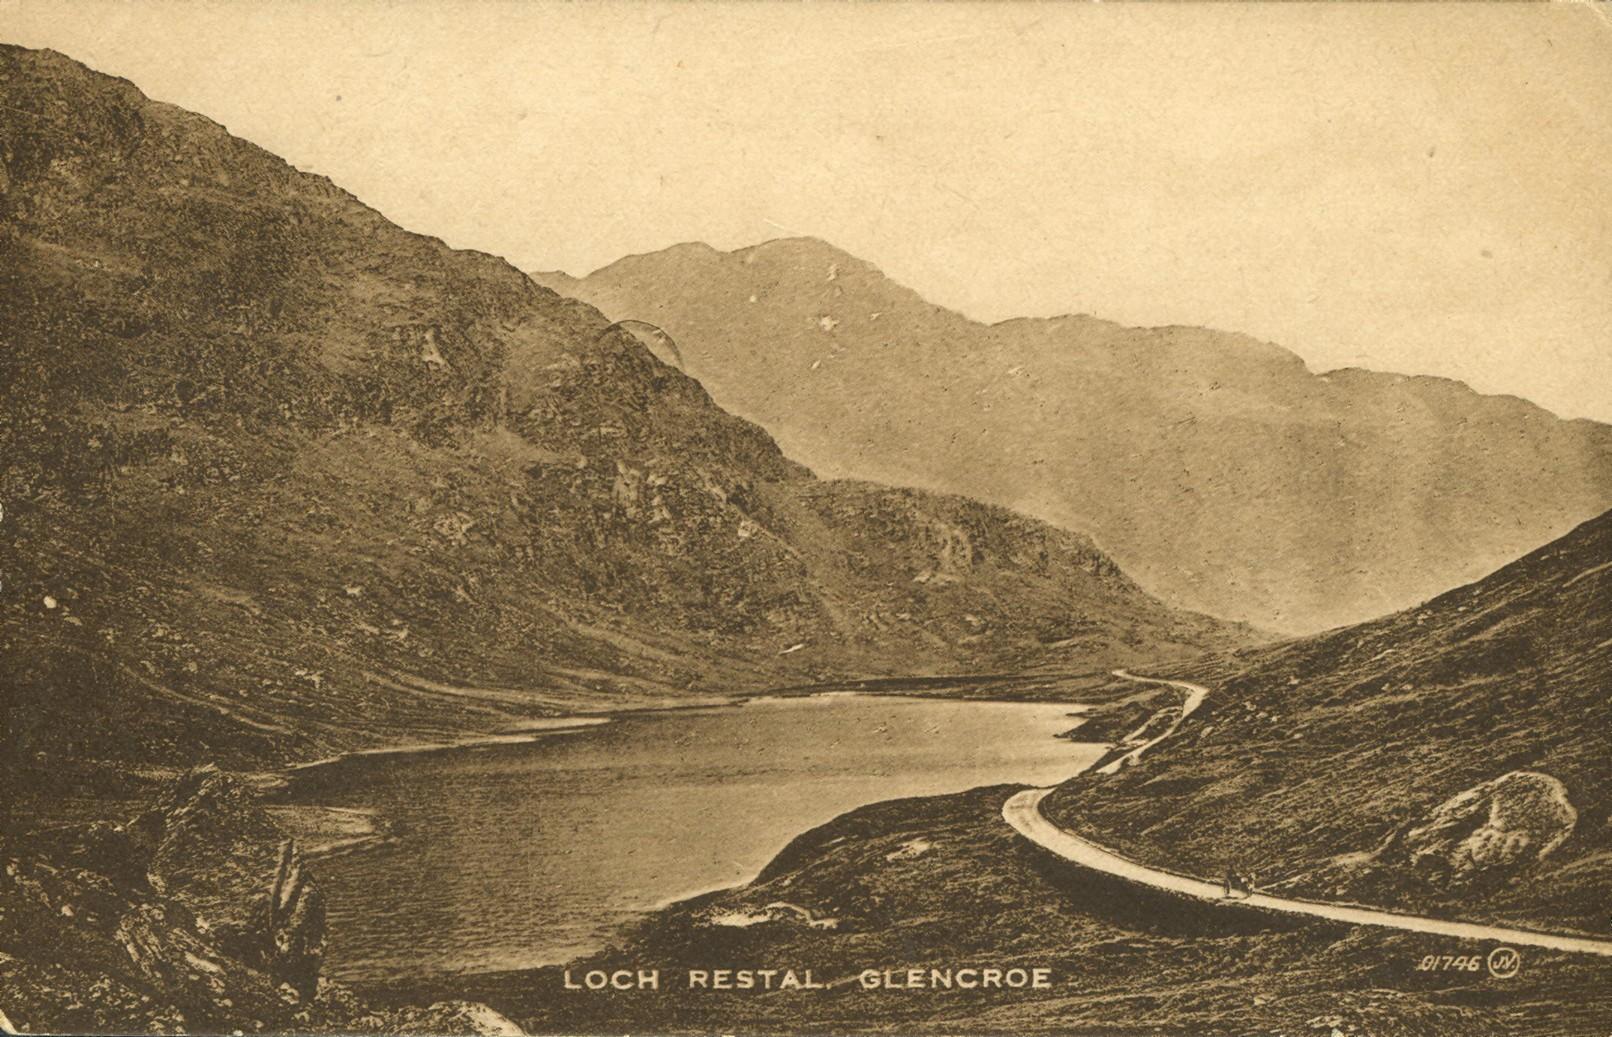 Loch Restal